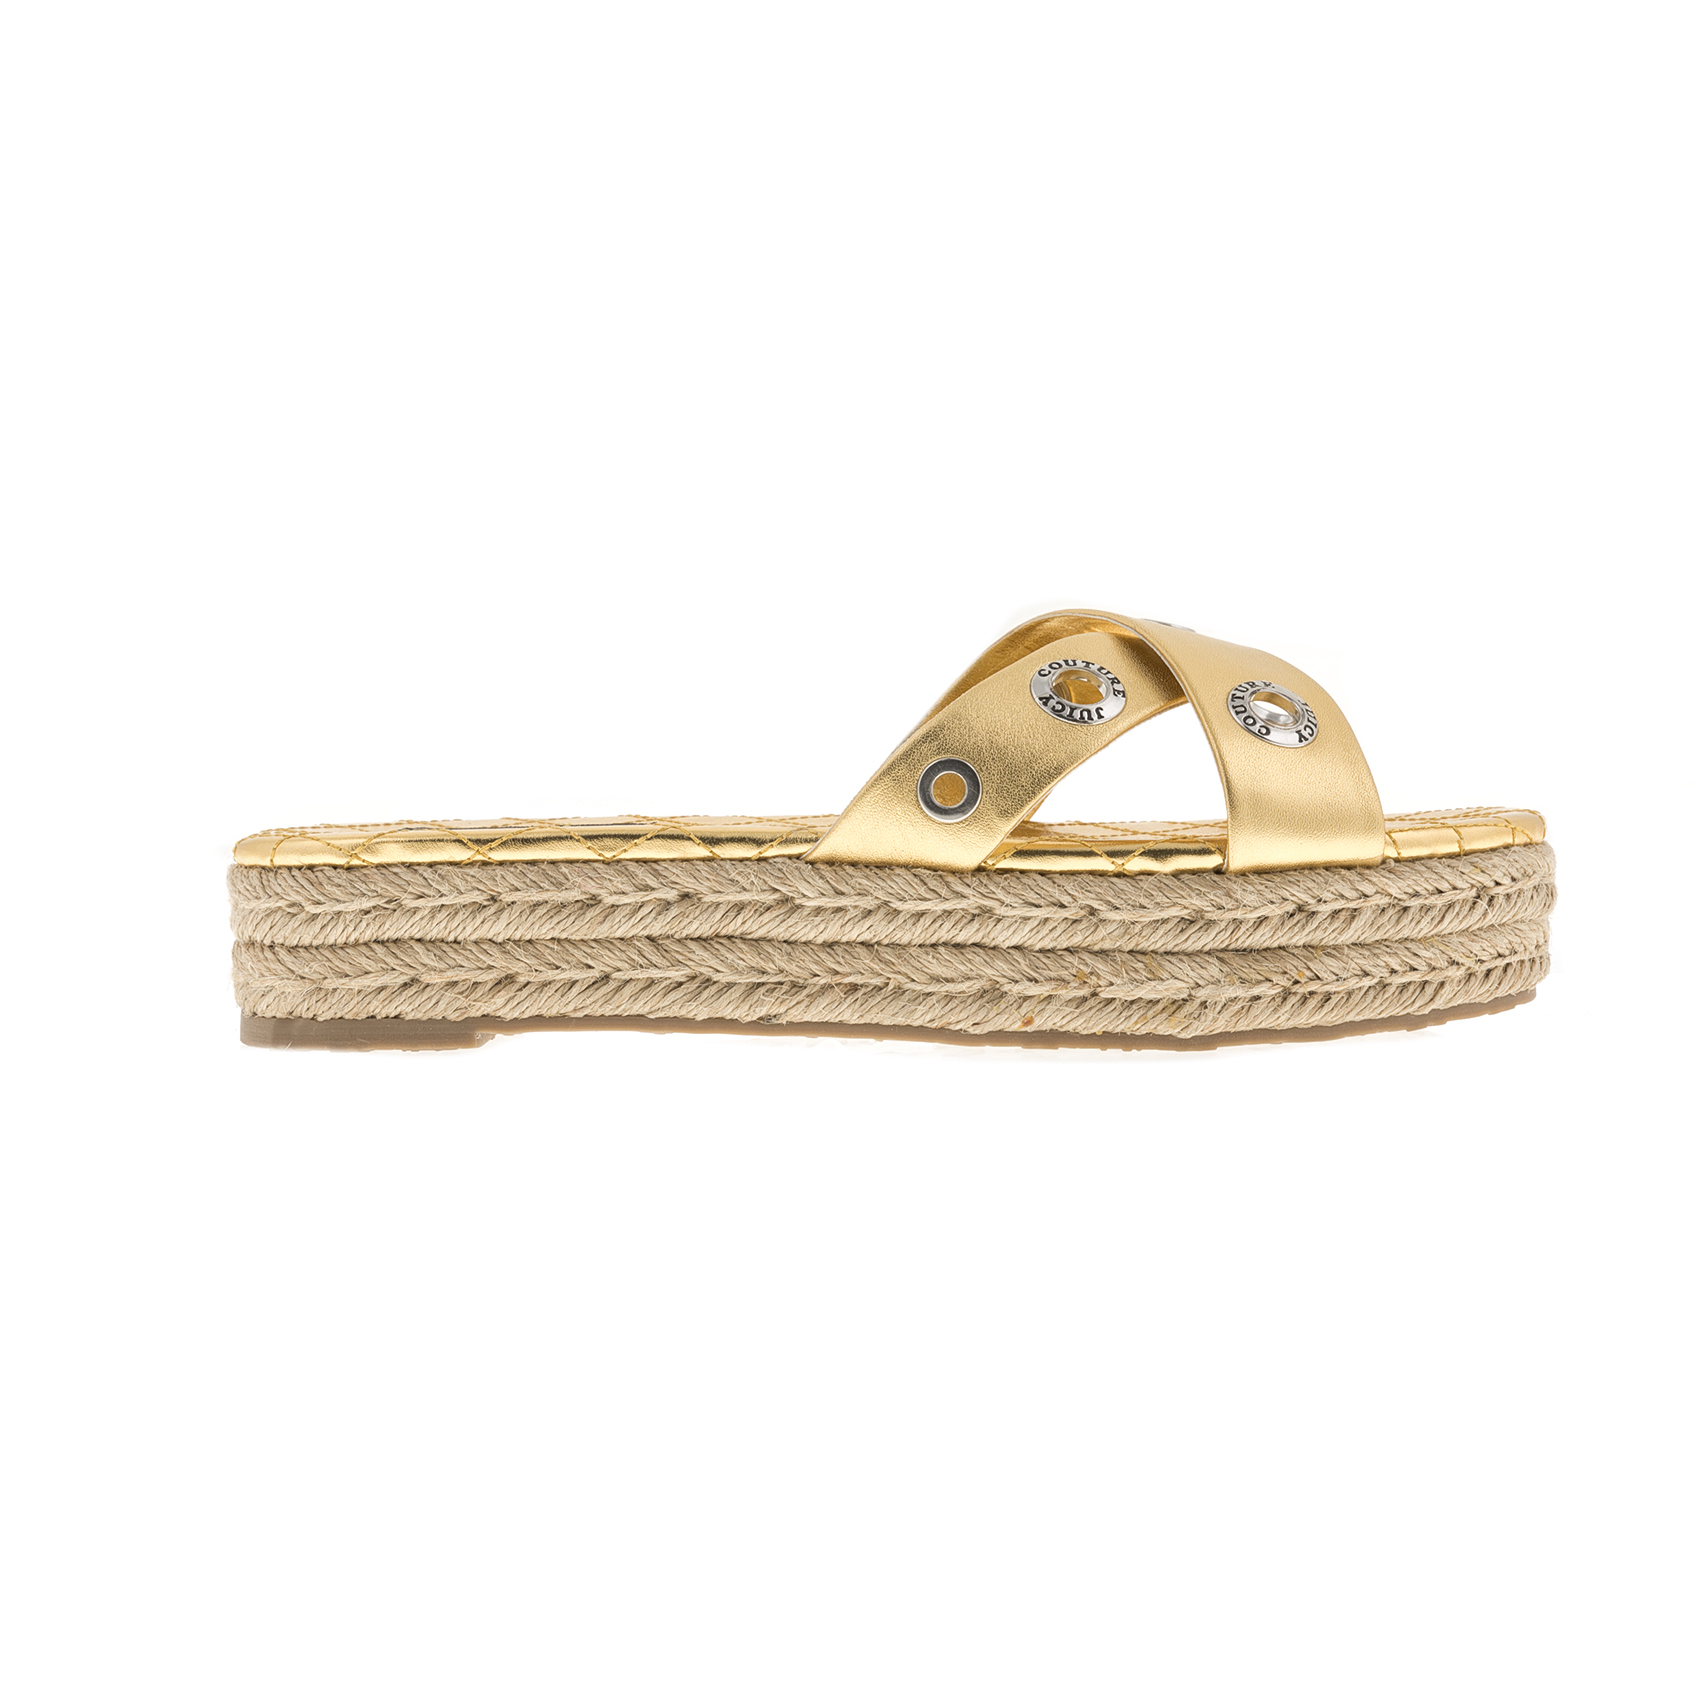 085689e52b4 JUICY COUTURE – Γυναικεία σανδάλια JUICY COUTURE PARISI χρυσά